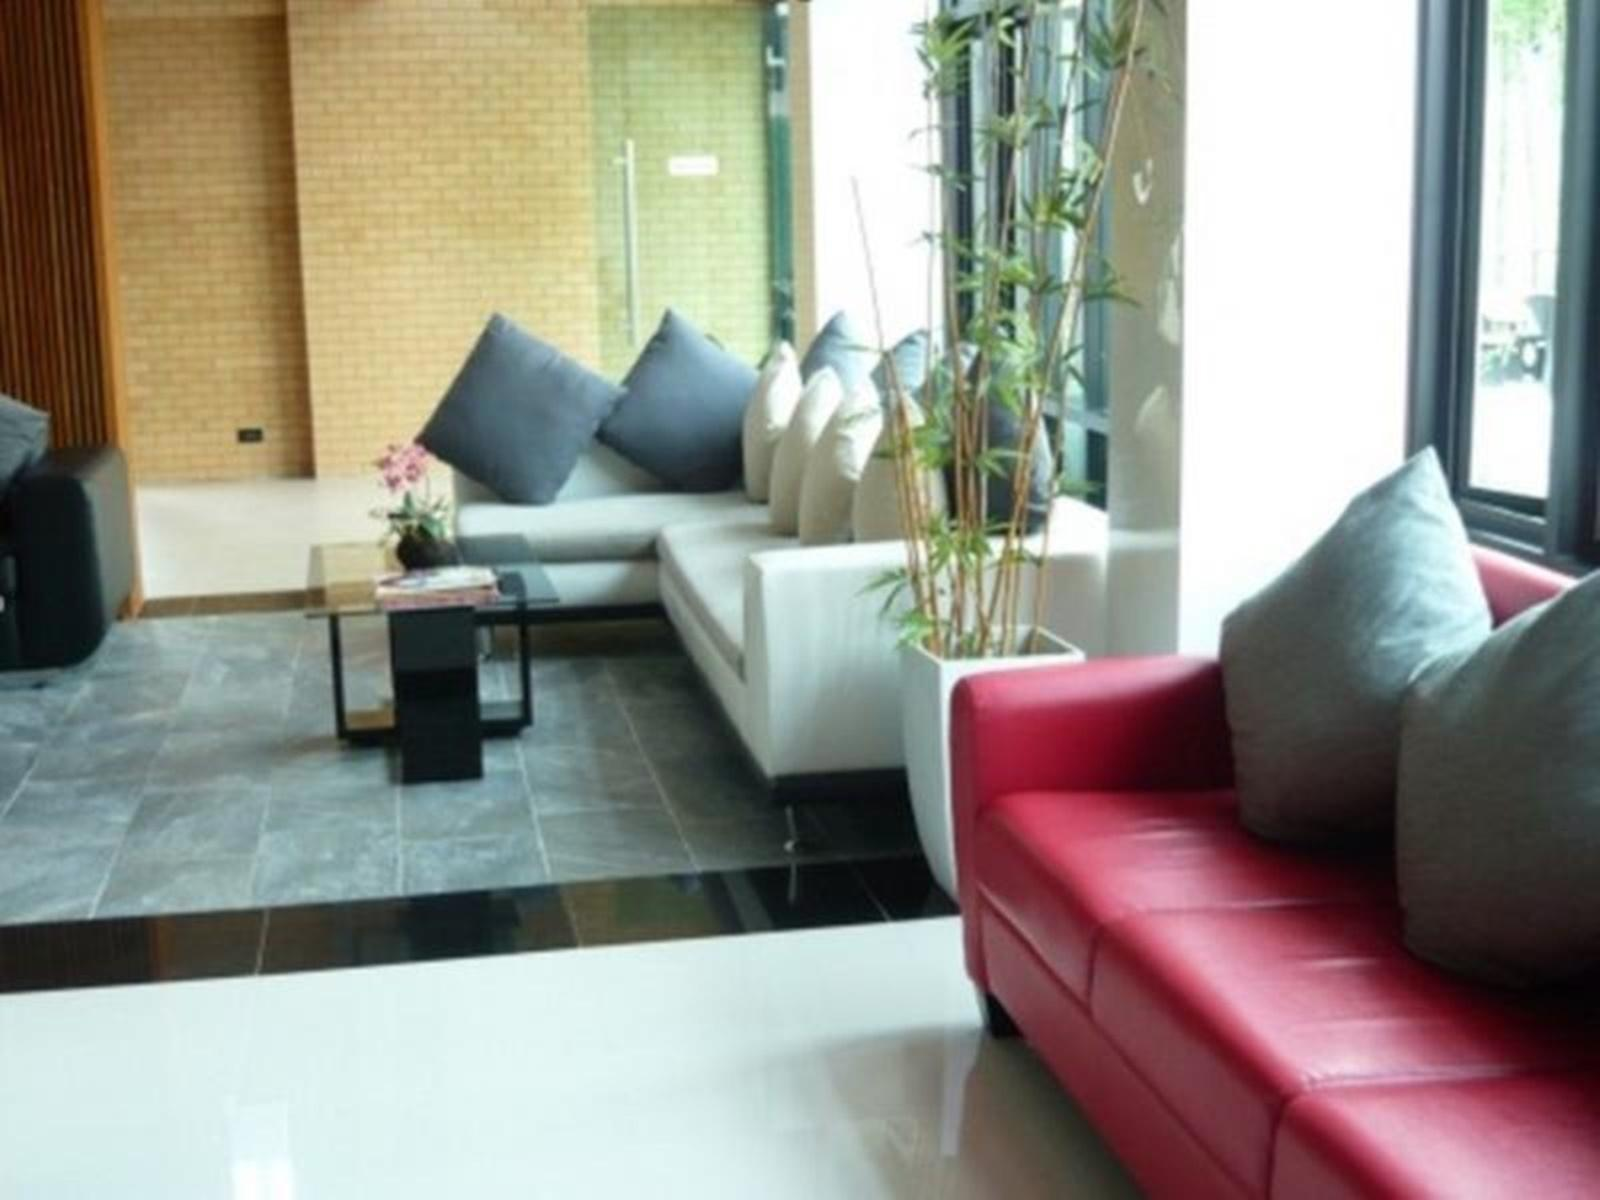 IZEN Budget Hotel & Residences ไอเซน บัดเจ็ท โฮเต็ล แอนด์ เรสซิเดนซ์